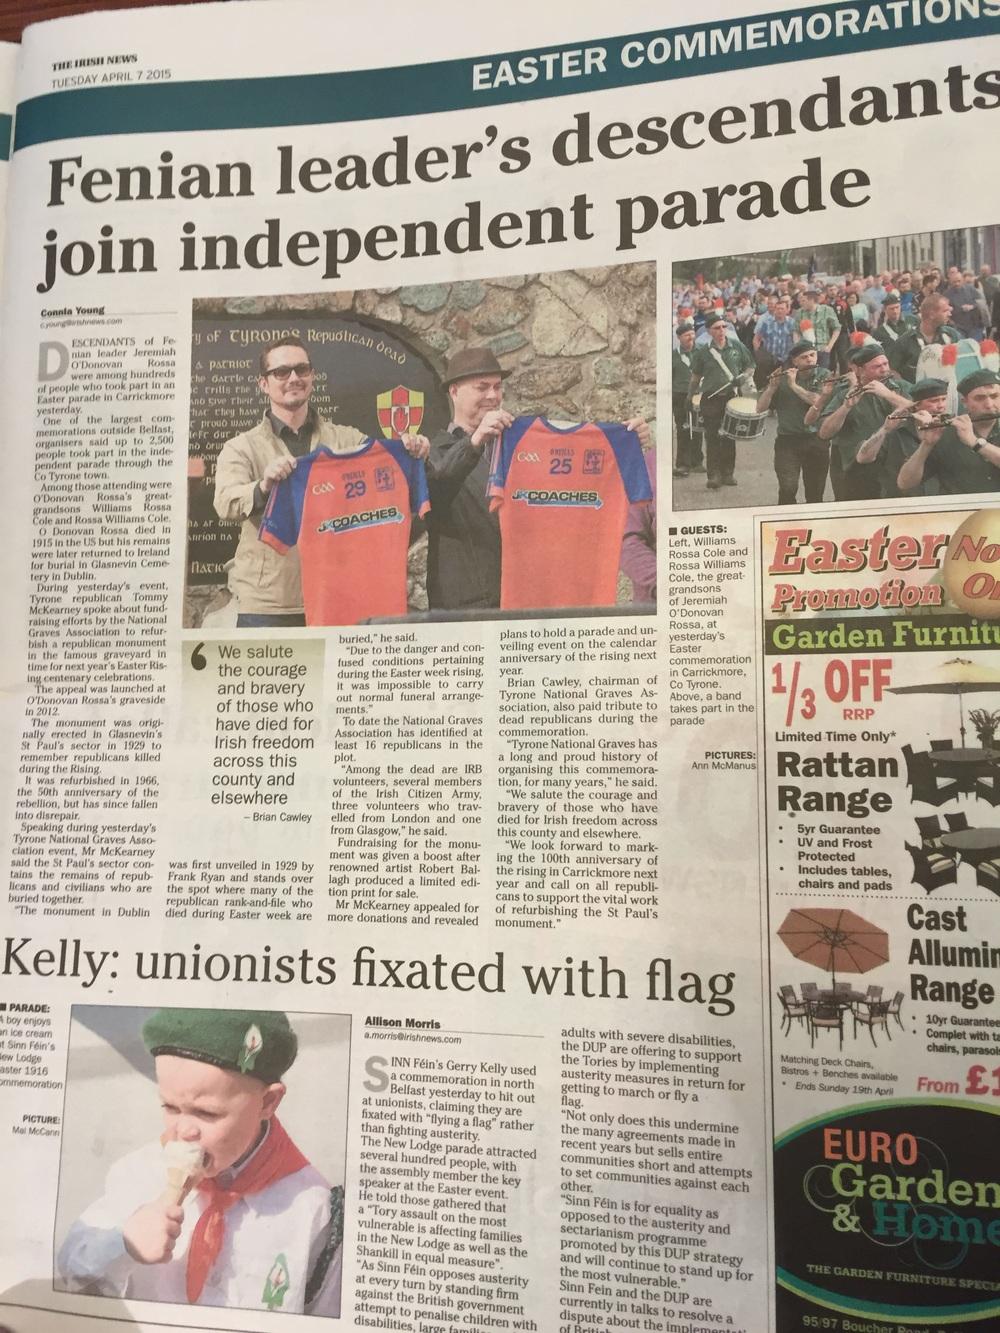 In the Irish News